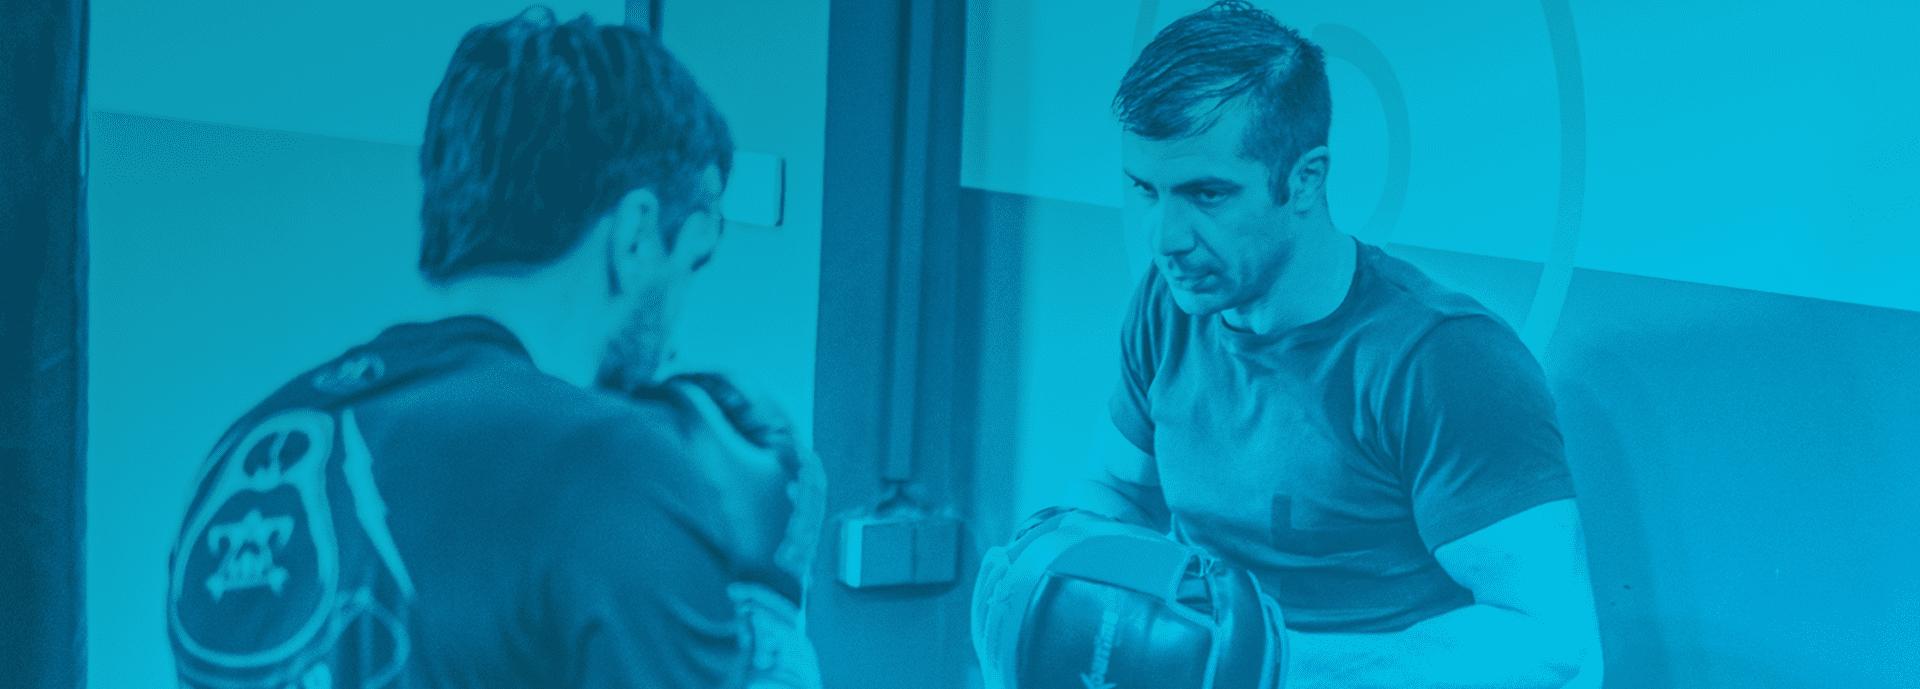 lockdown-iz-perspektive-personalnog-trenera